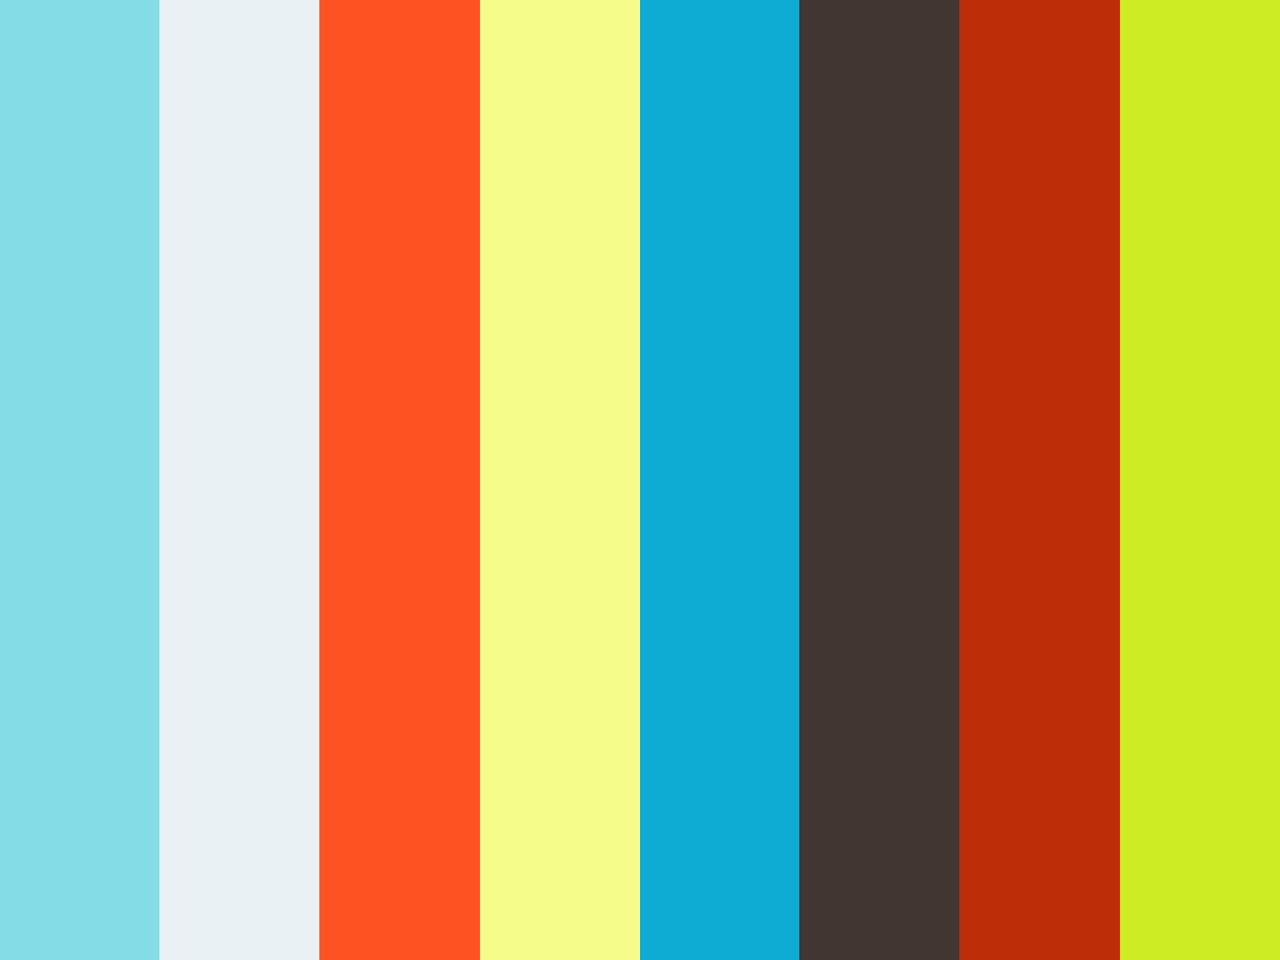 GH5 vs. Blackmagic Micro - Colorgrading/matching